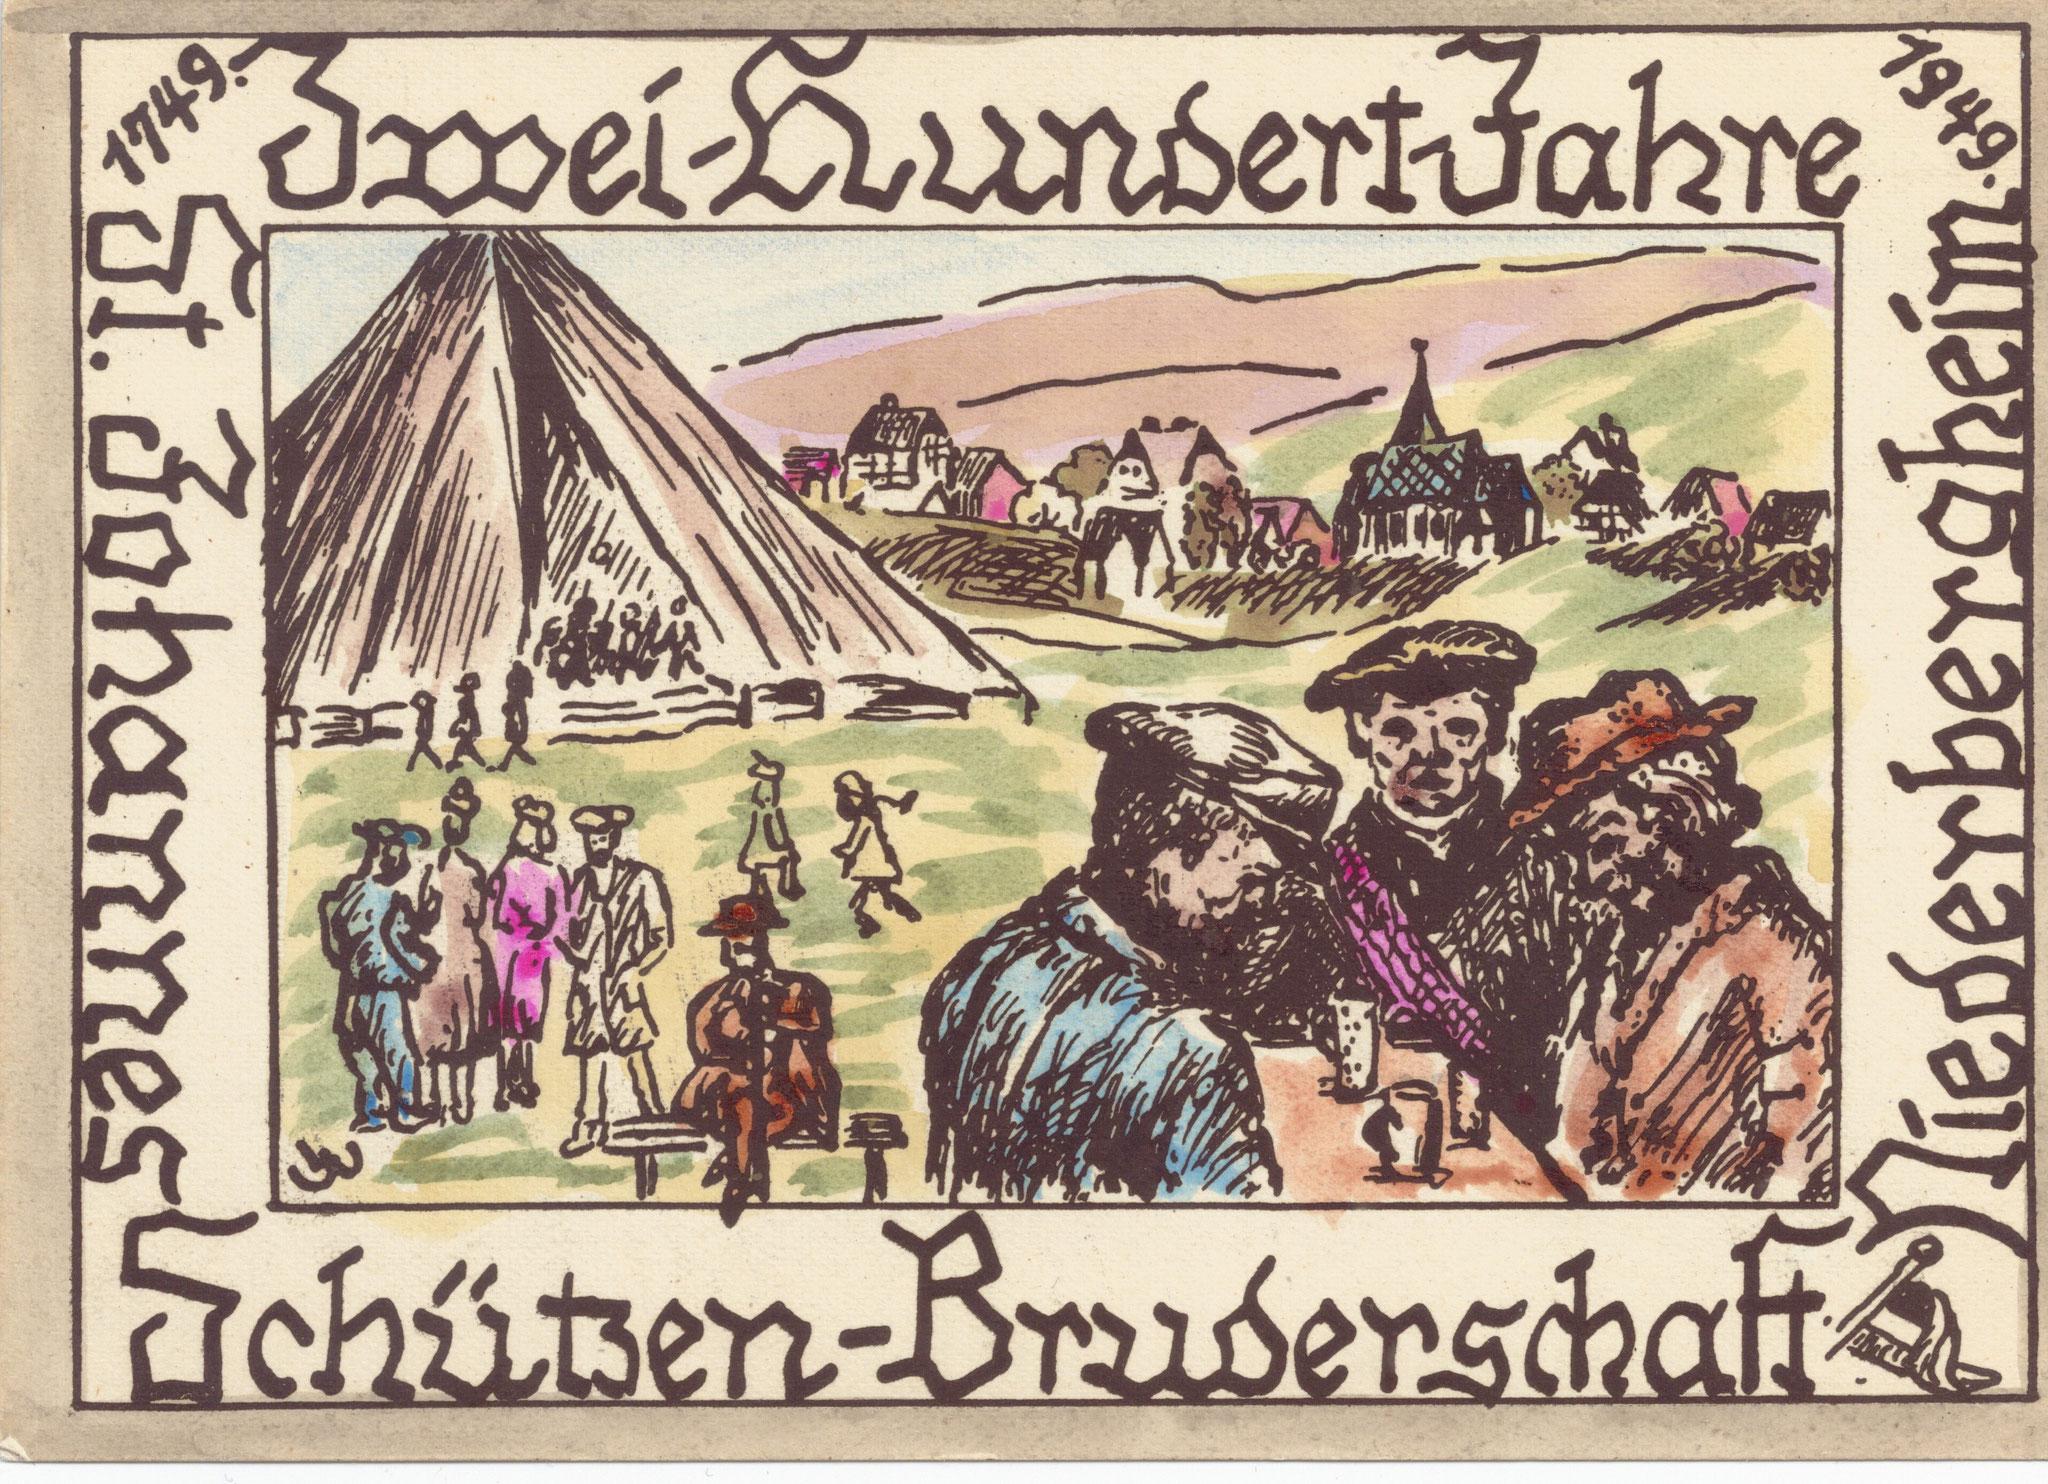 Ansichtskarte zum Jubiläum der Schützenbruderschaft 1949